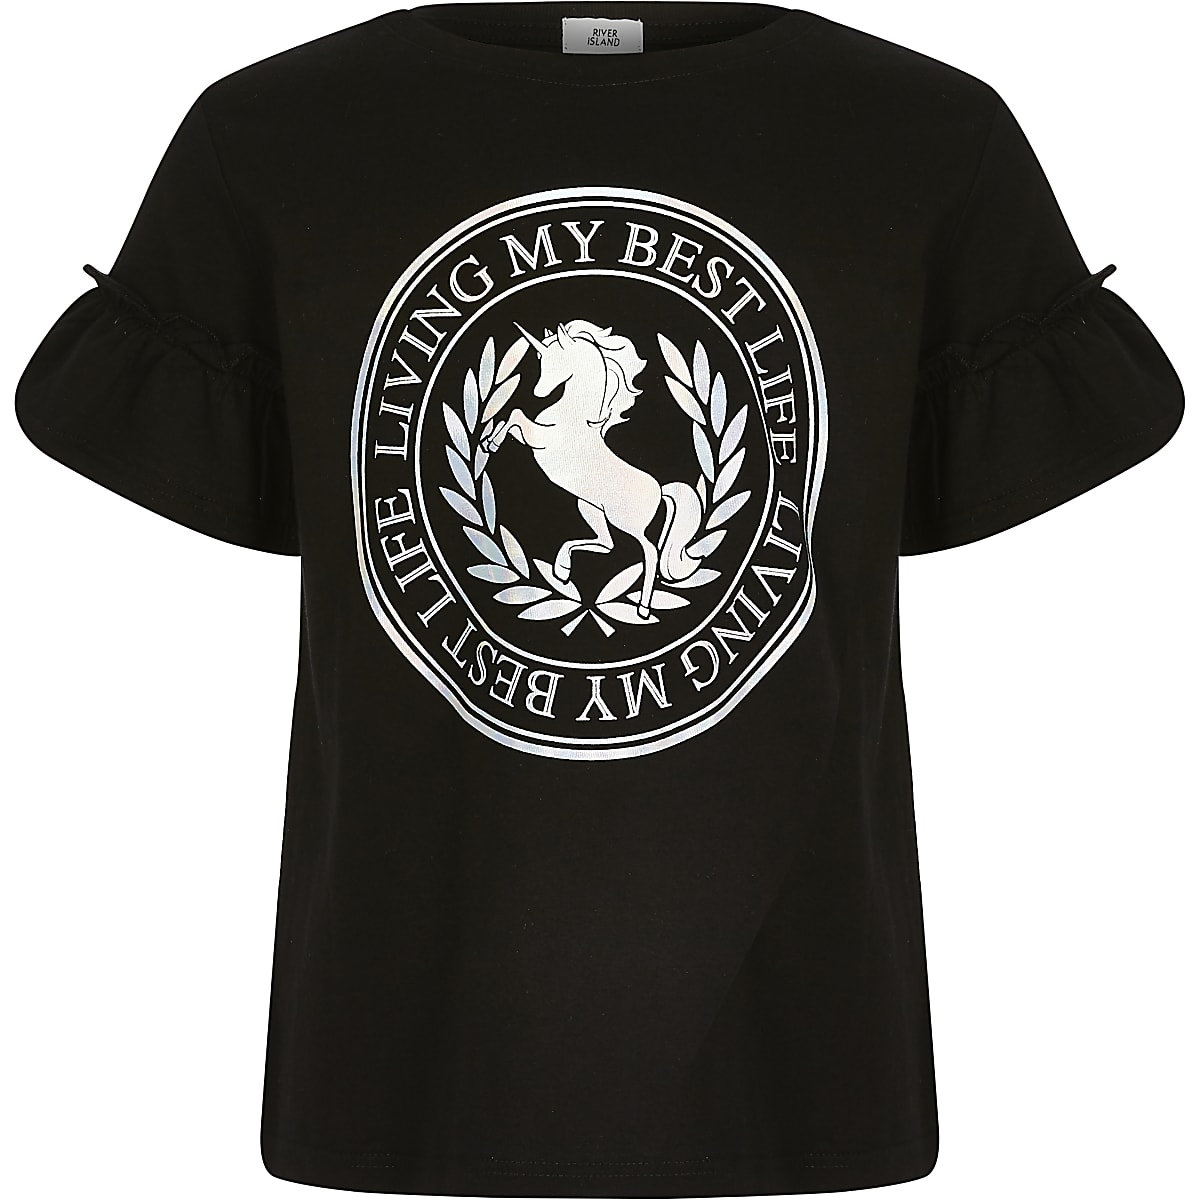 Girls black 'Best Life' unicorn print T-shirt